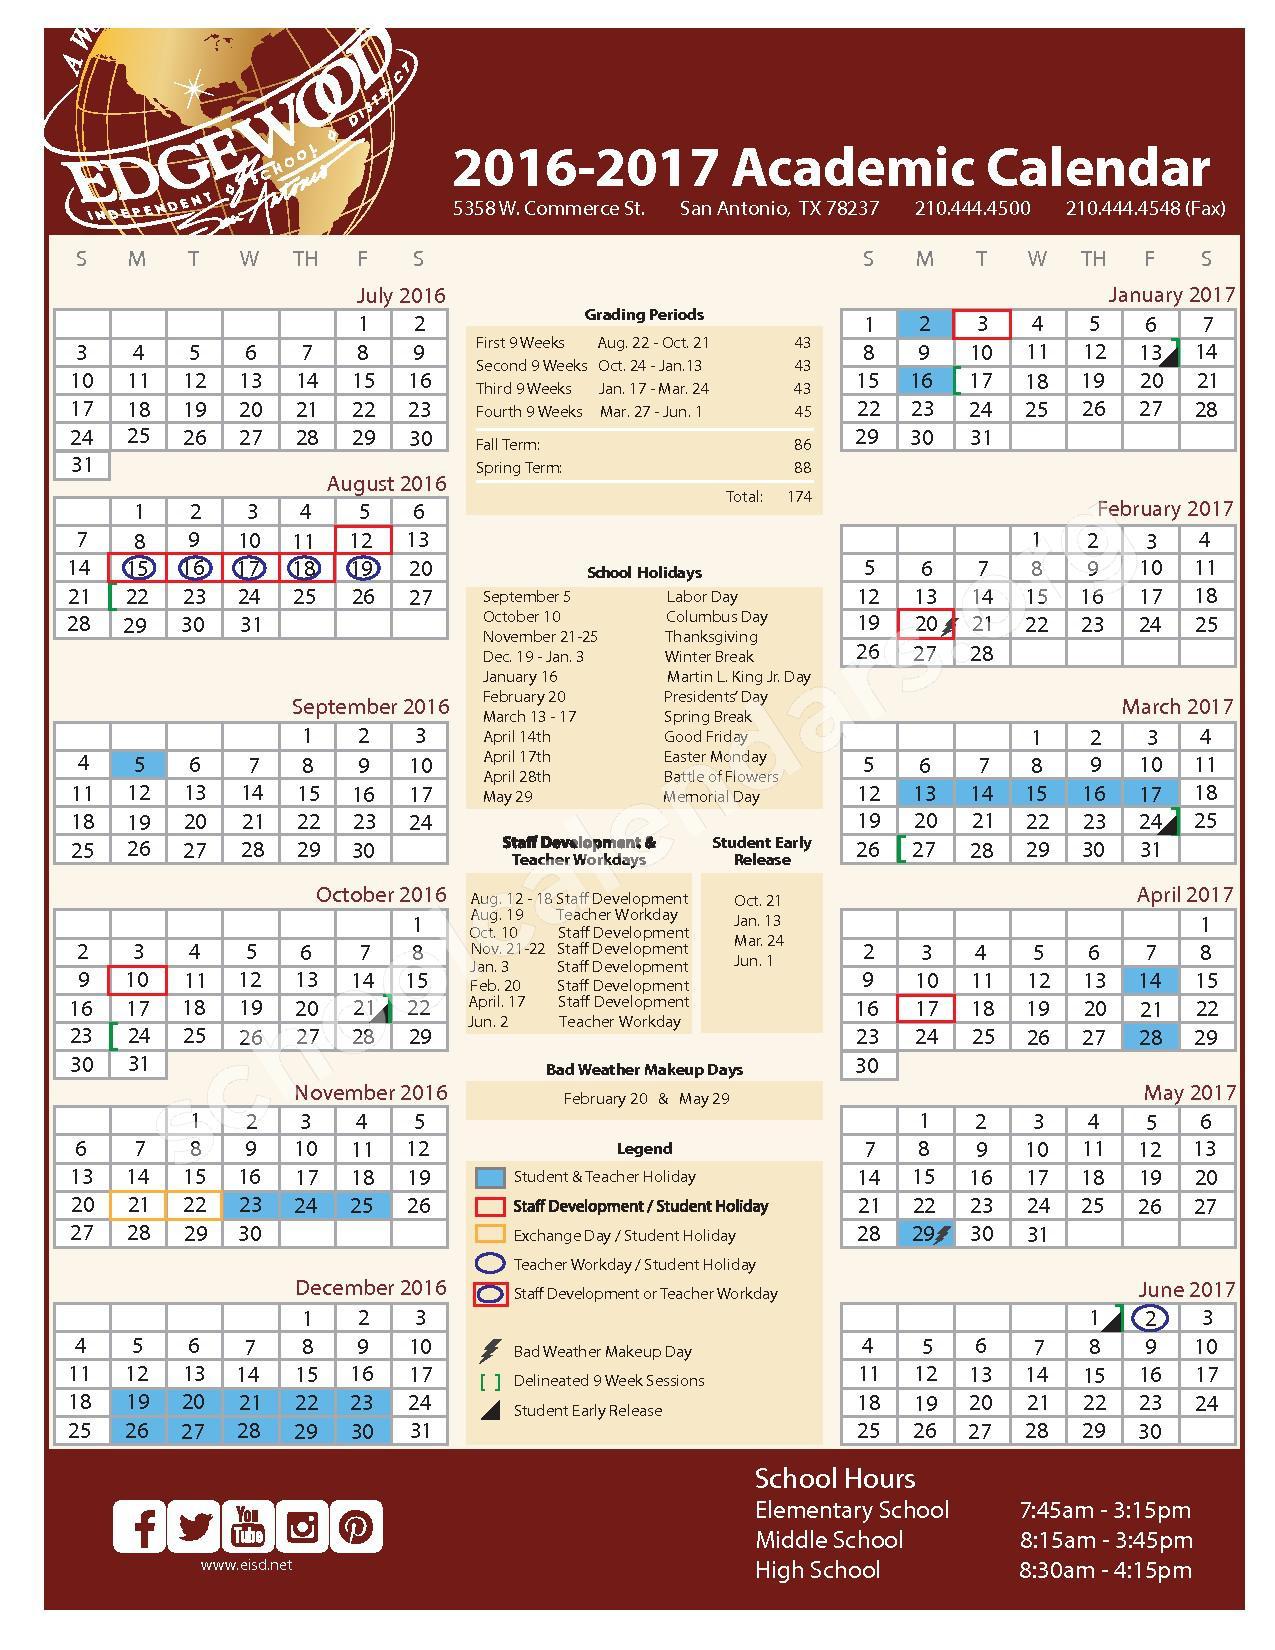 2016 - 2017 Academic Calendar – Edgewood Independent School District (Bexar County) – page 1